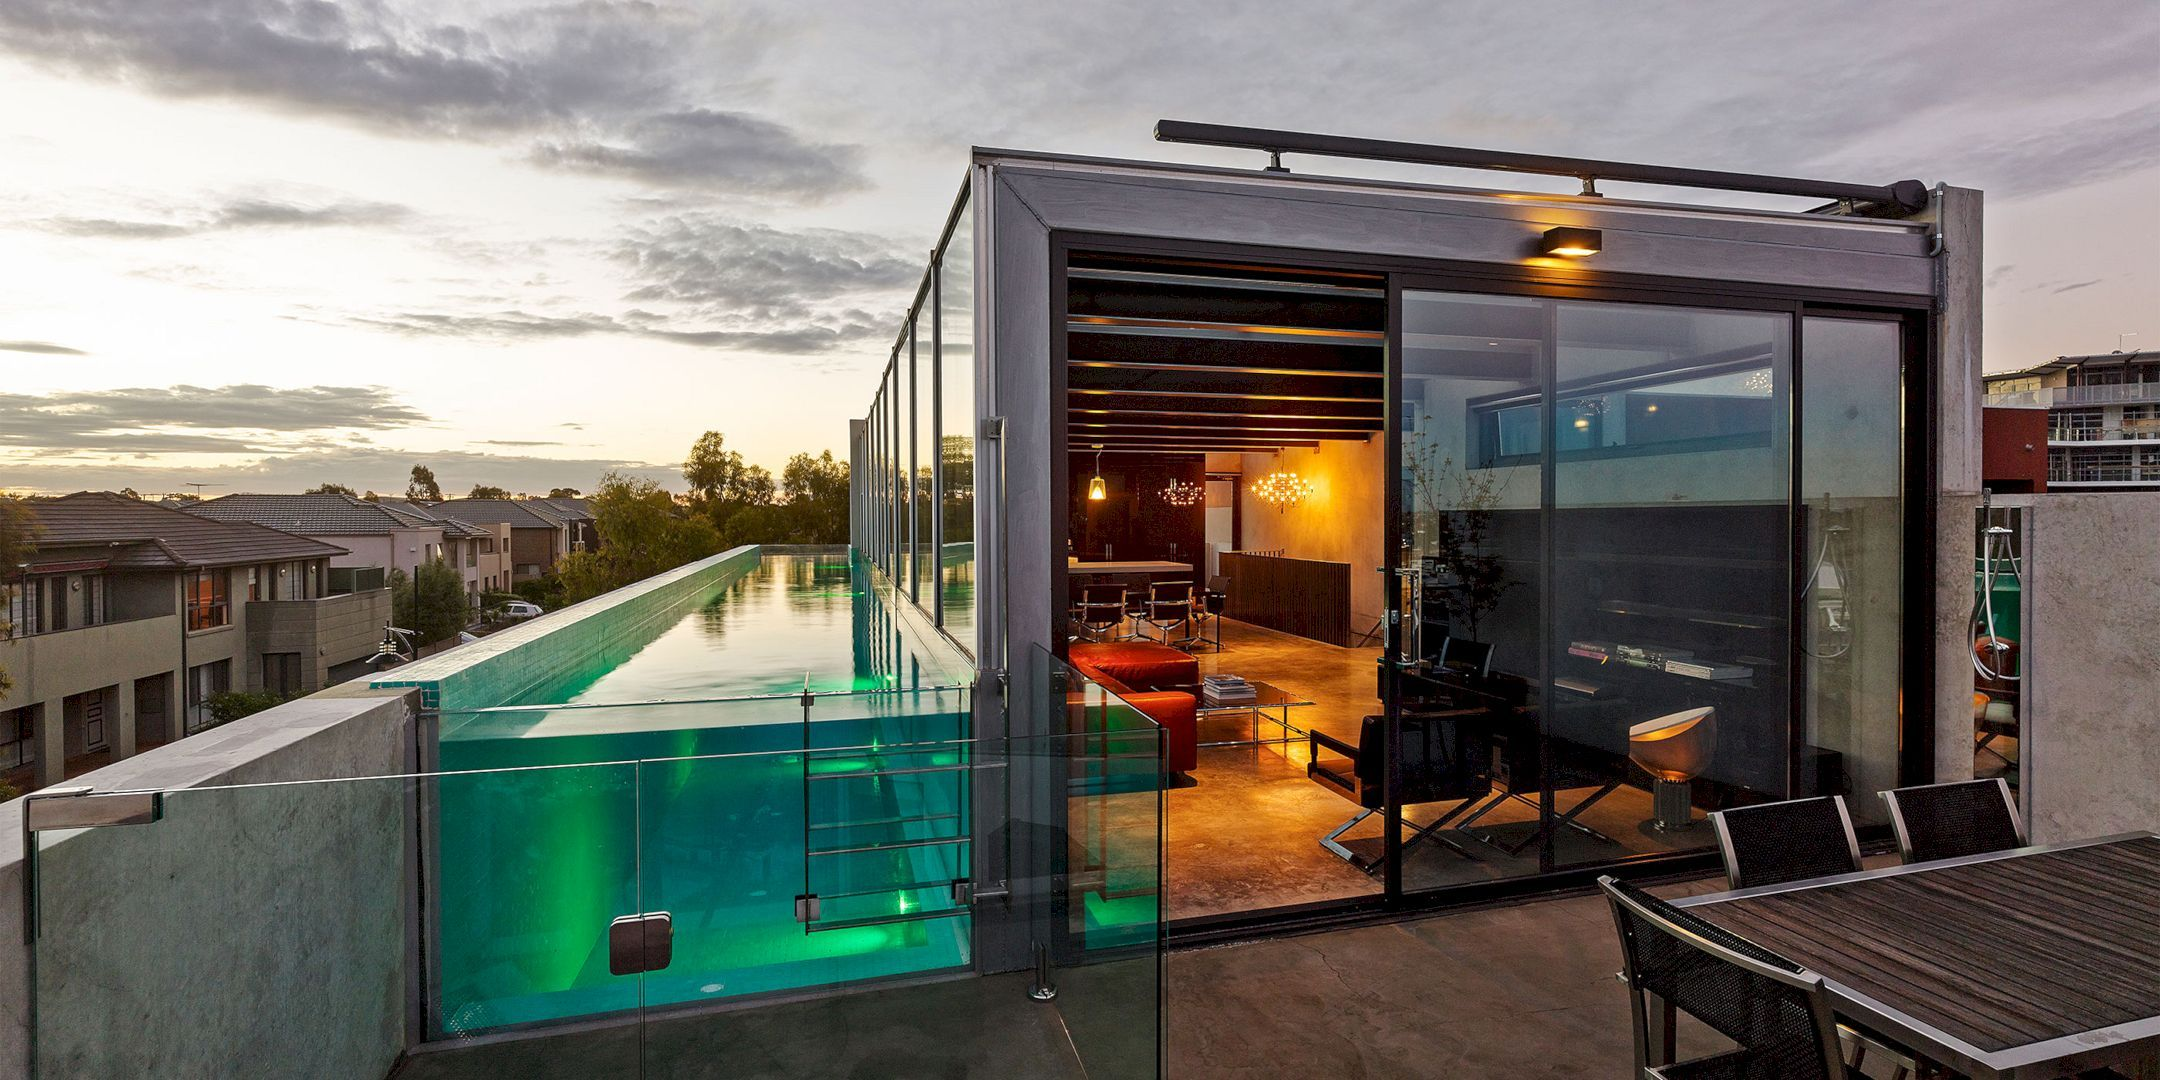 Skyline Project Contemporary House With Concrete Walls Rooftop Terrace Design Terrace Design Concrete House